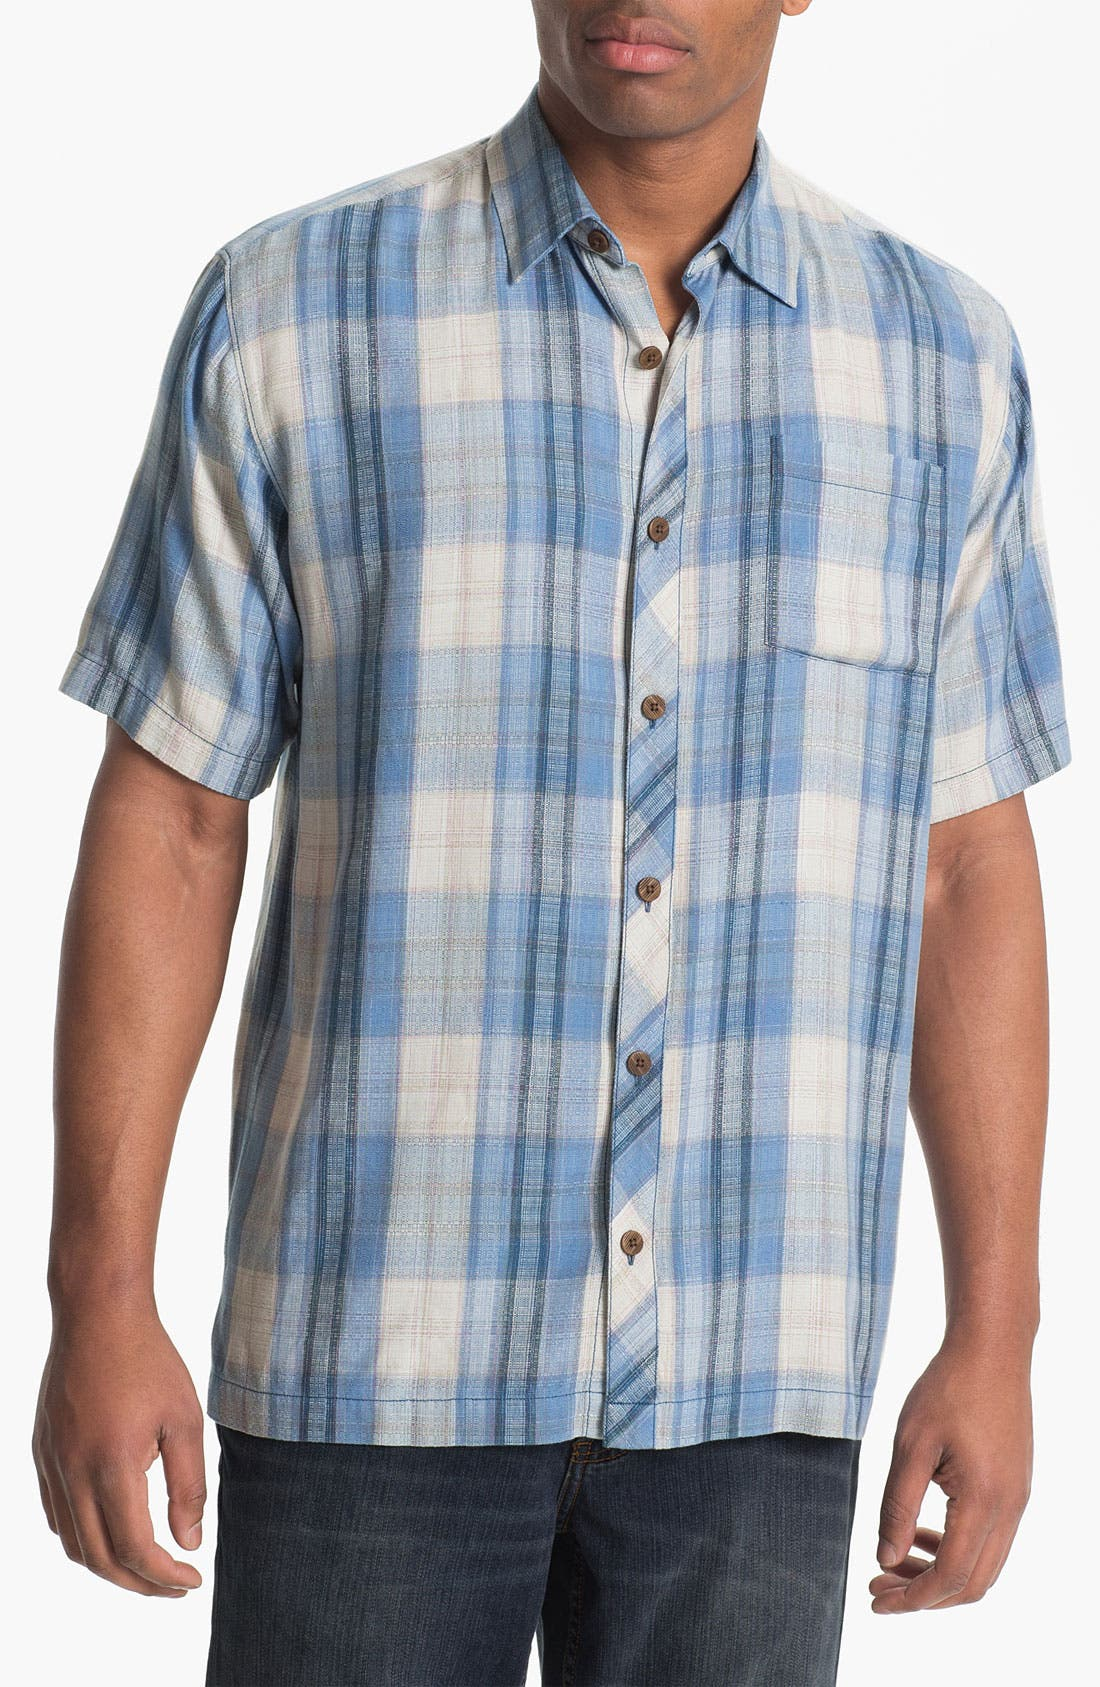 Main Image - Tommy Bahama 'Seaside Plaid' Silk Campshirt (Big & Tall)